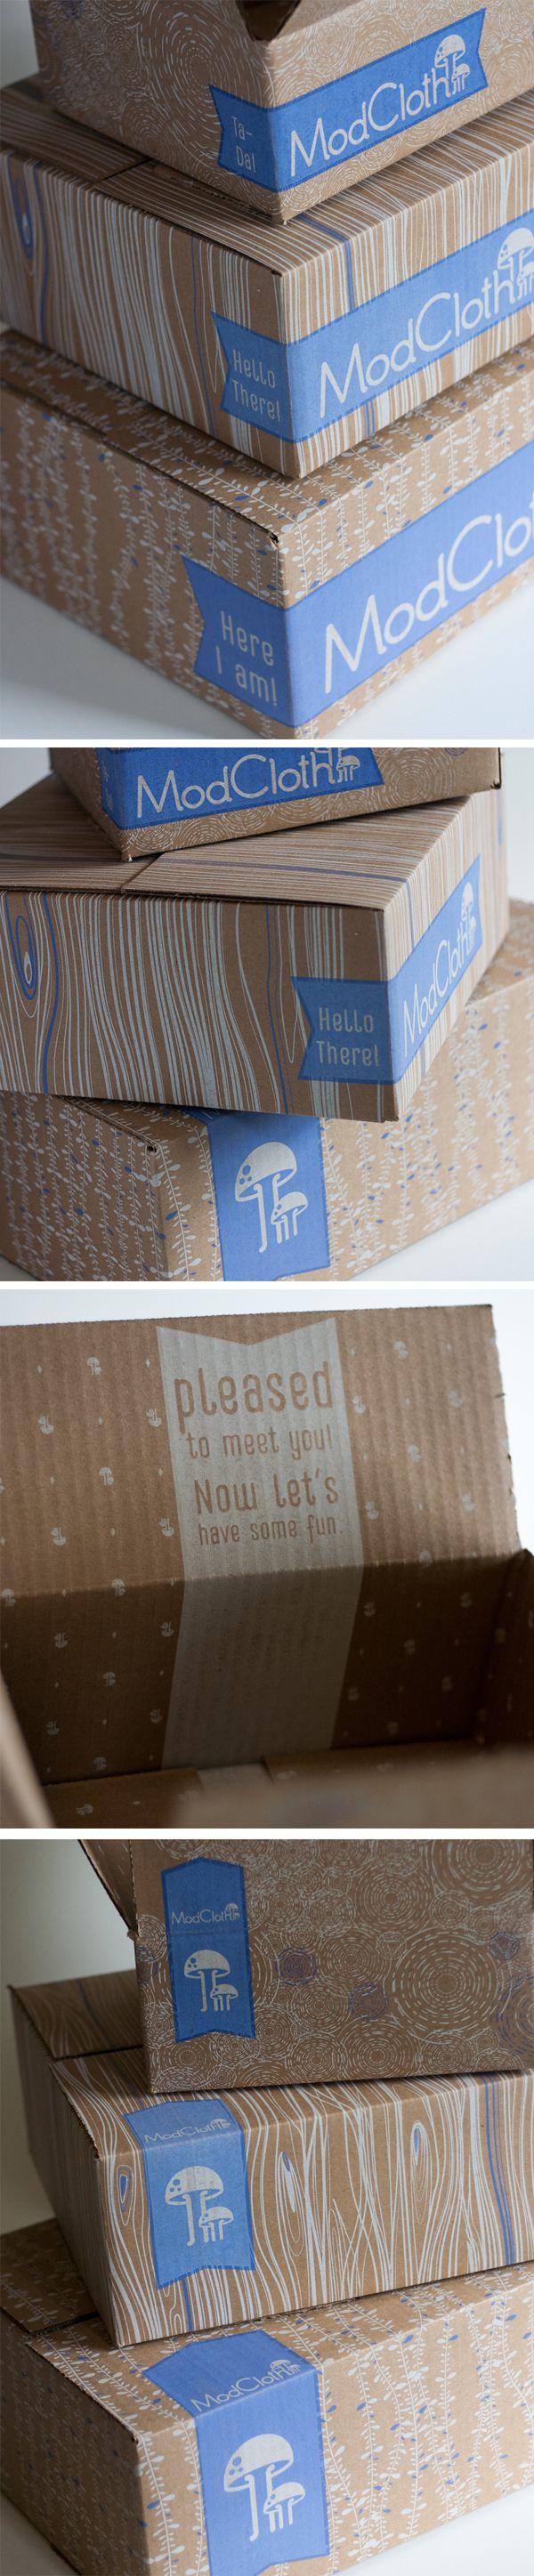 ModCloth 2013 Shipping Boxes by Joseph DeFerrari, via Behance